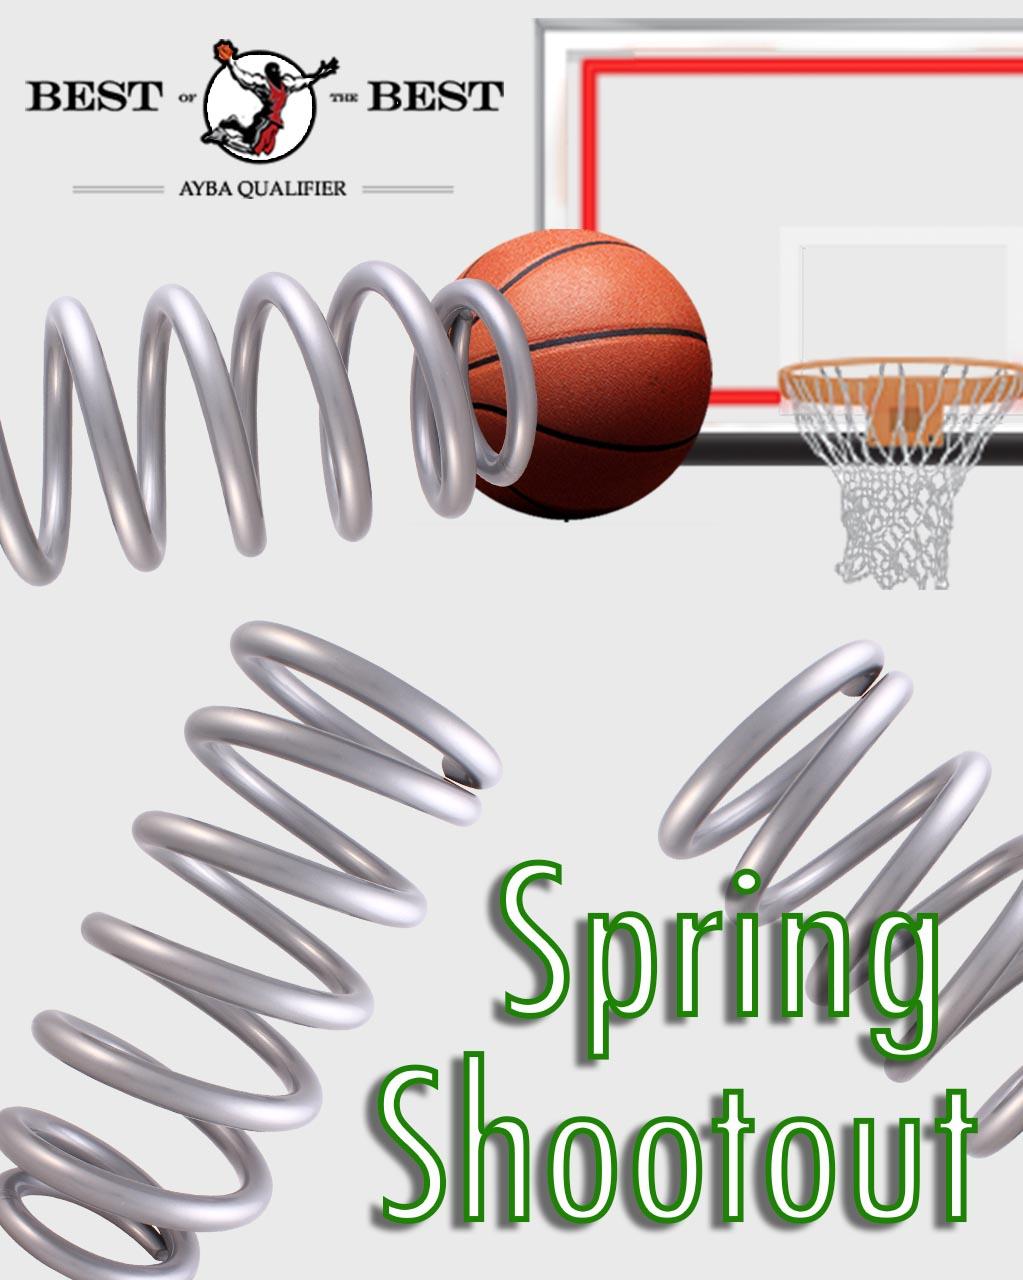 Spring_Shootout_BestoftheBest_2019.jpg